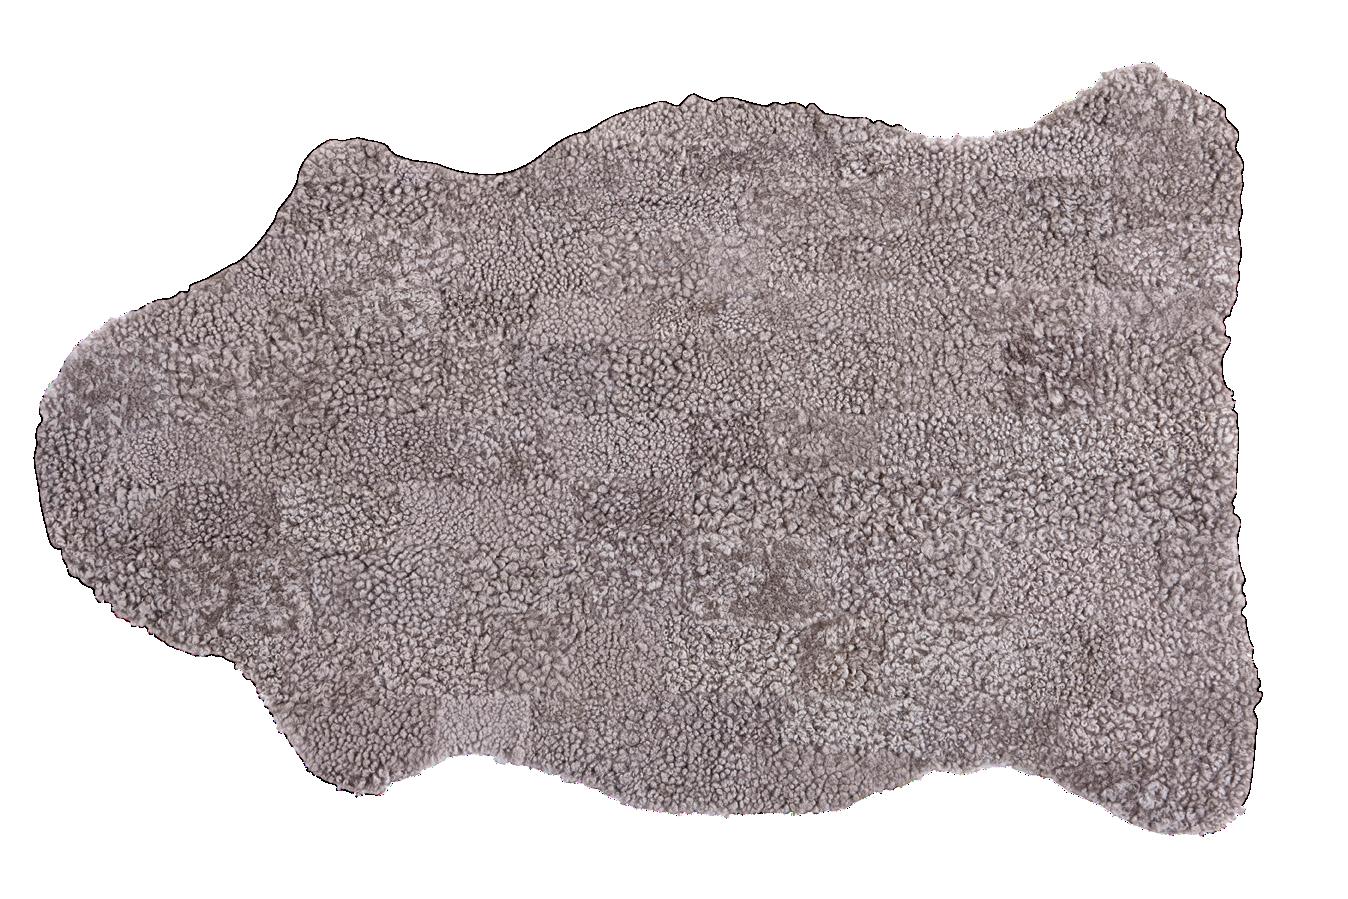 Shepherd - Gry fårskinn 120x80 cm - Natur